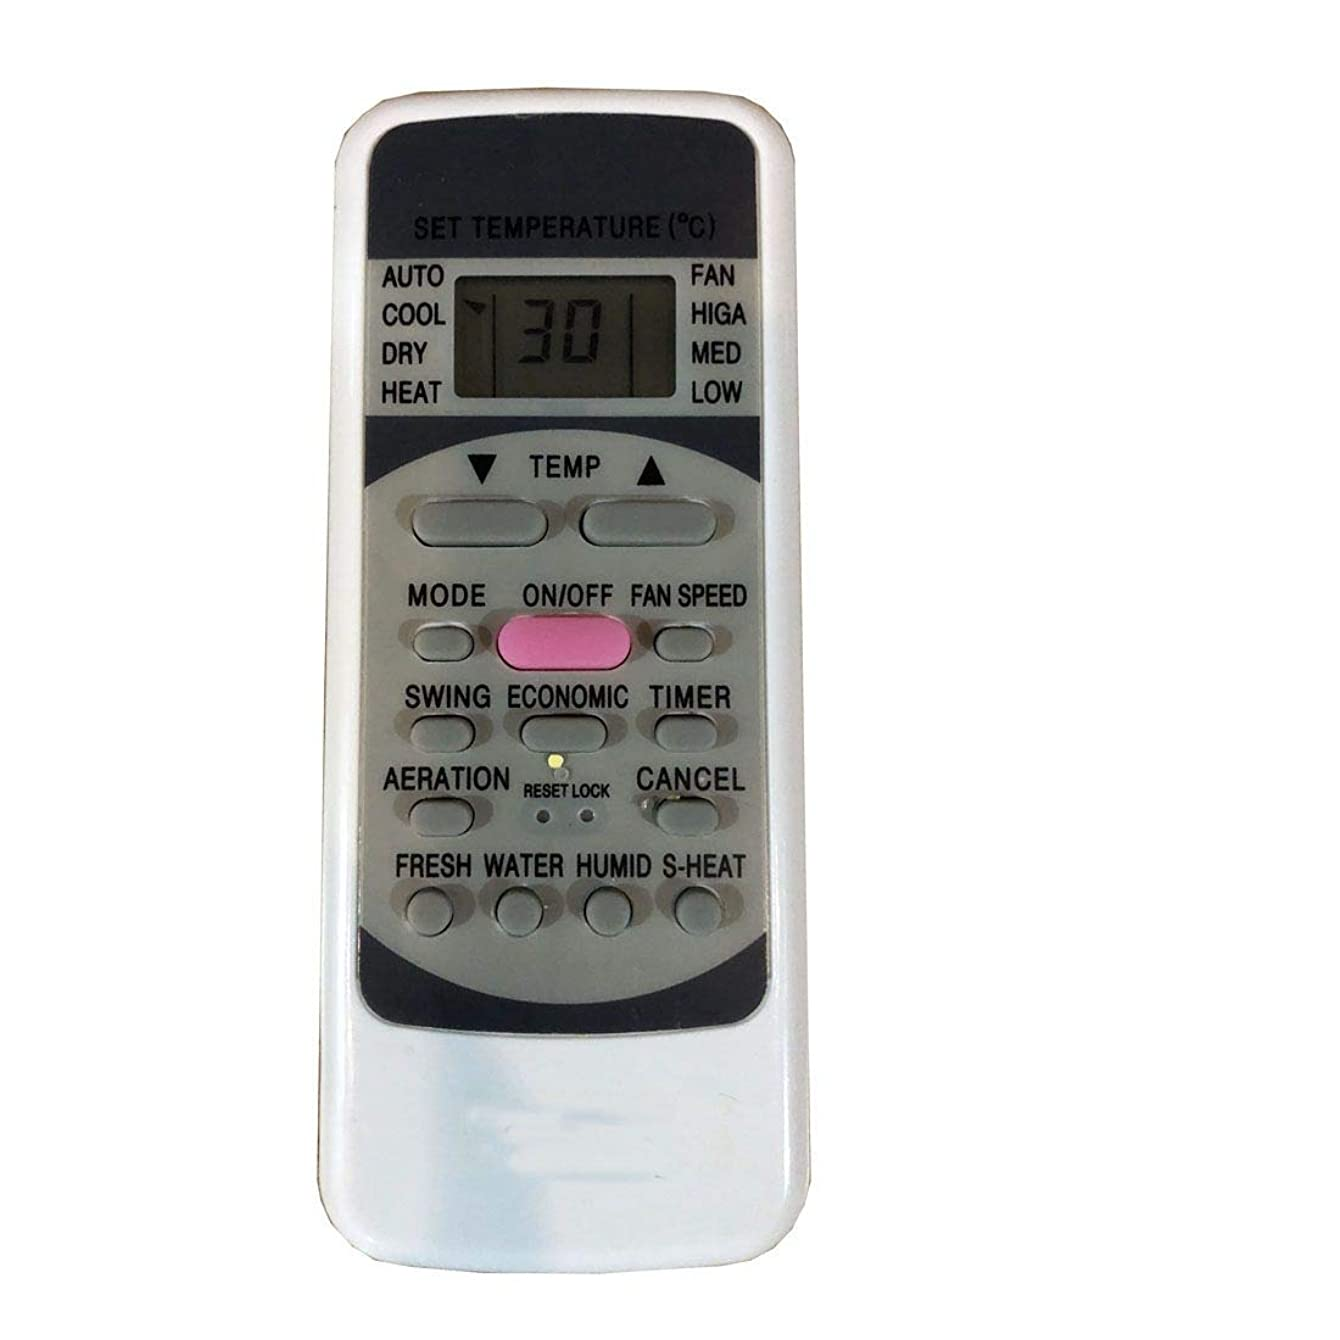 EREMOTE Easy Replacement Remote Control Fit for klimaire KSWM018-C213 KSWM024-C213 KSWM009-H113 KSIN009-H215 KSIN012-H215 AC A/C Air Conditioner